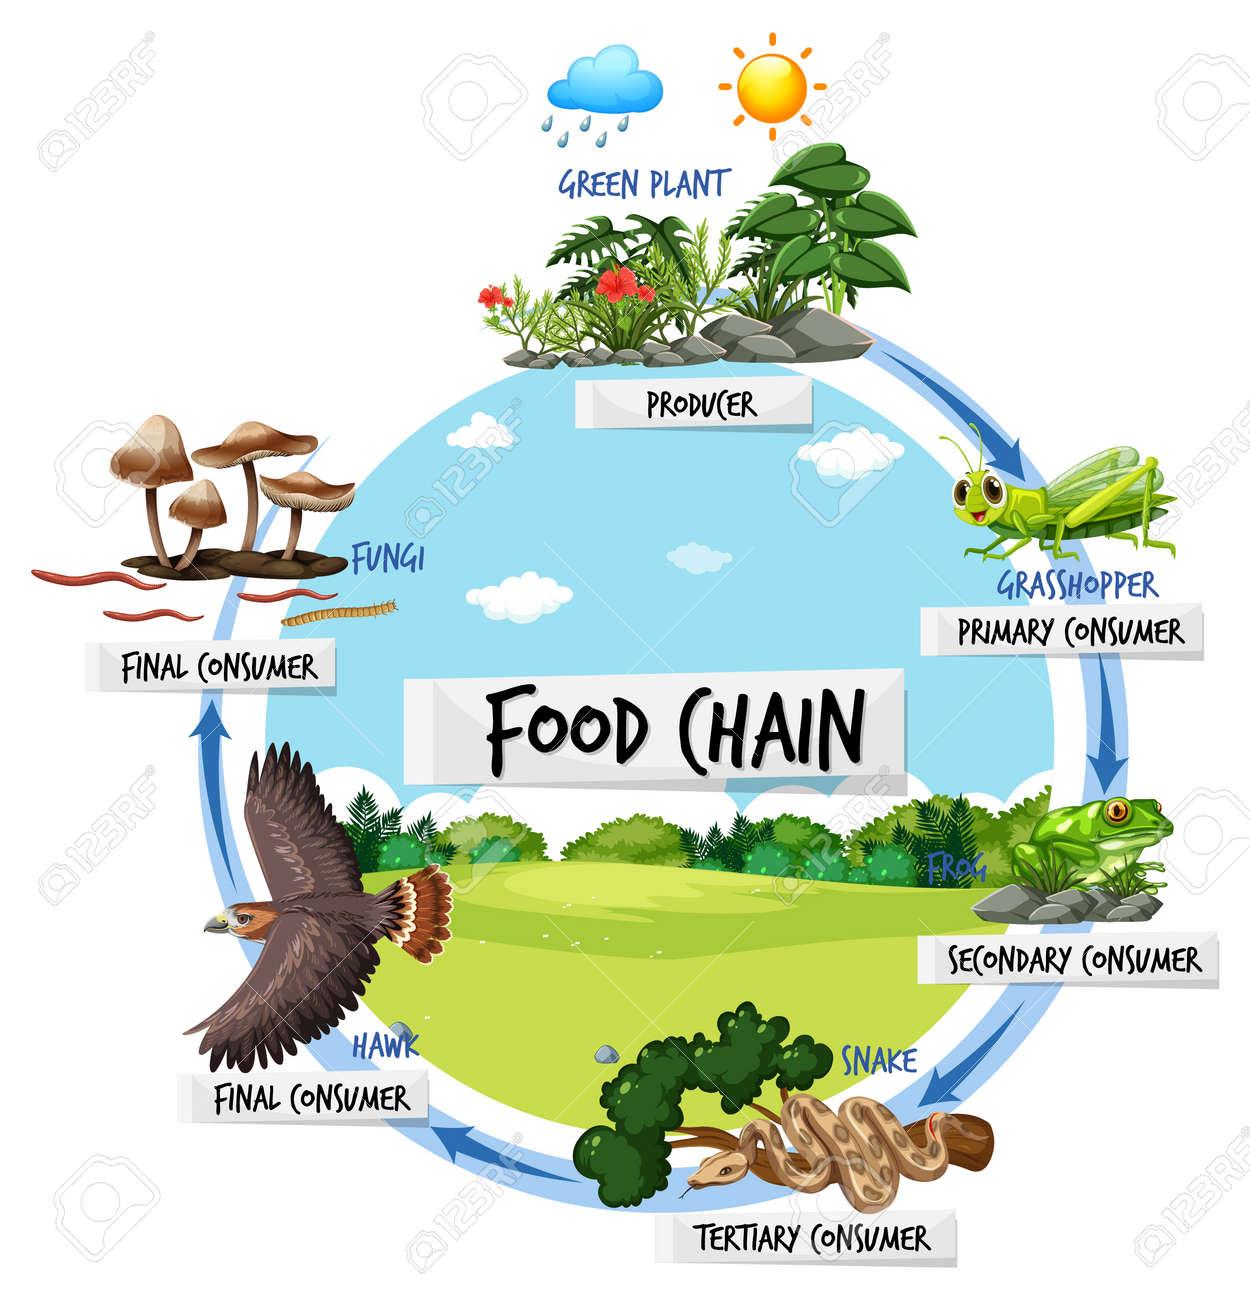 Food chain diagram concept illustration - 166417596